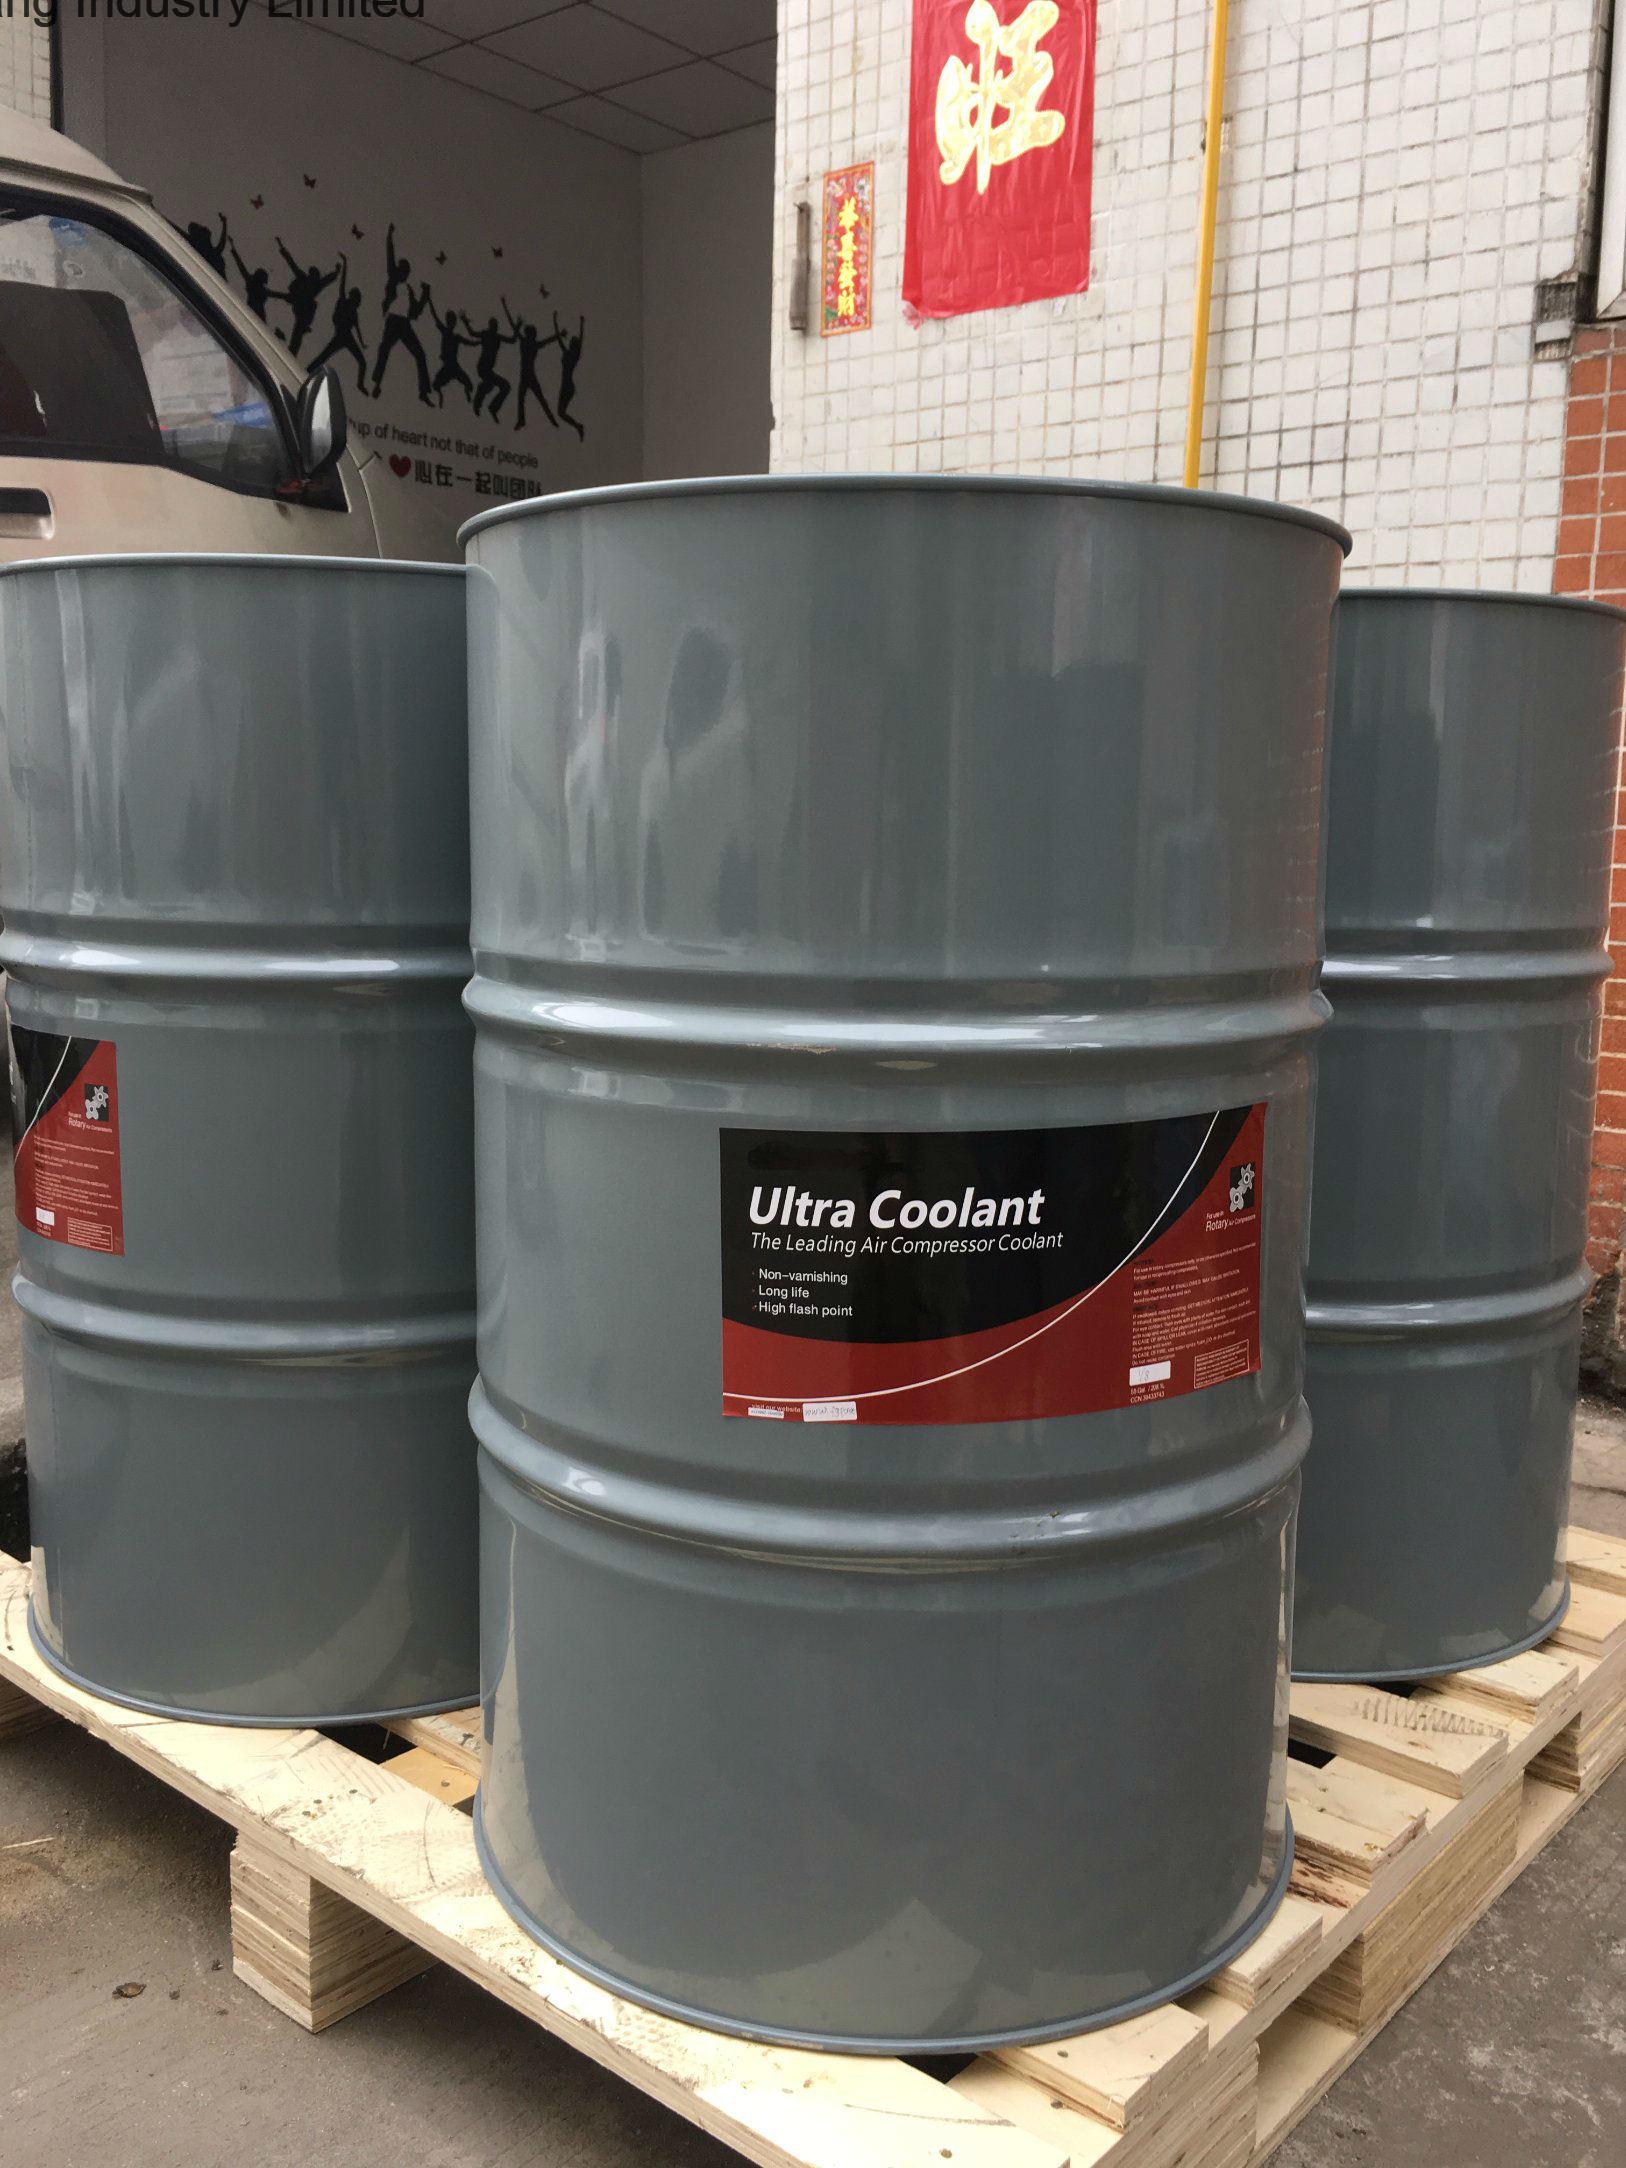 Ingersoll-Rand SSR Ultra Coolant 92692292